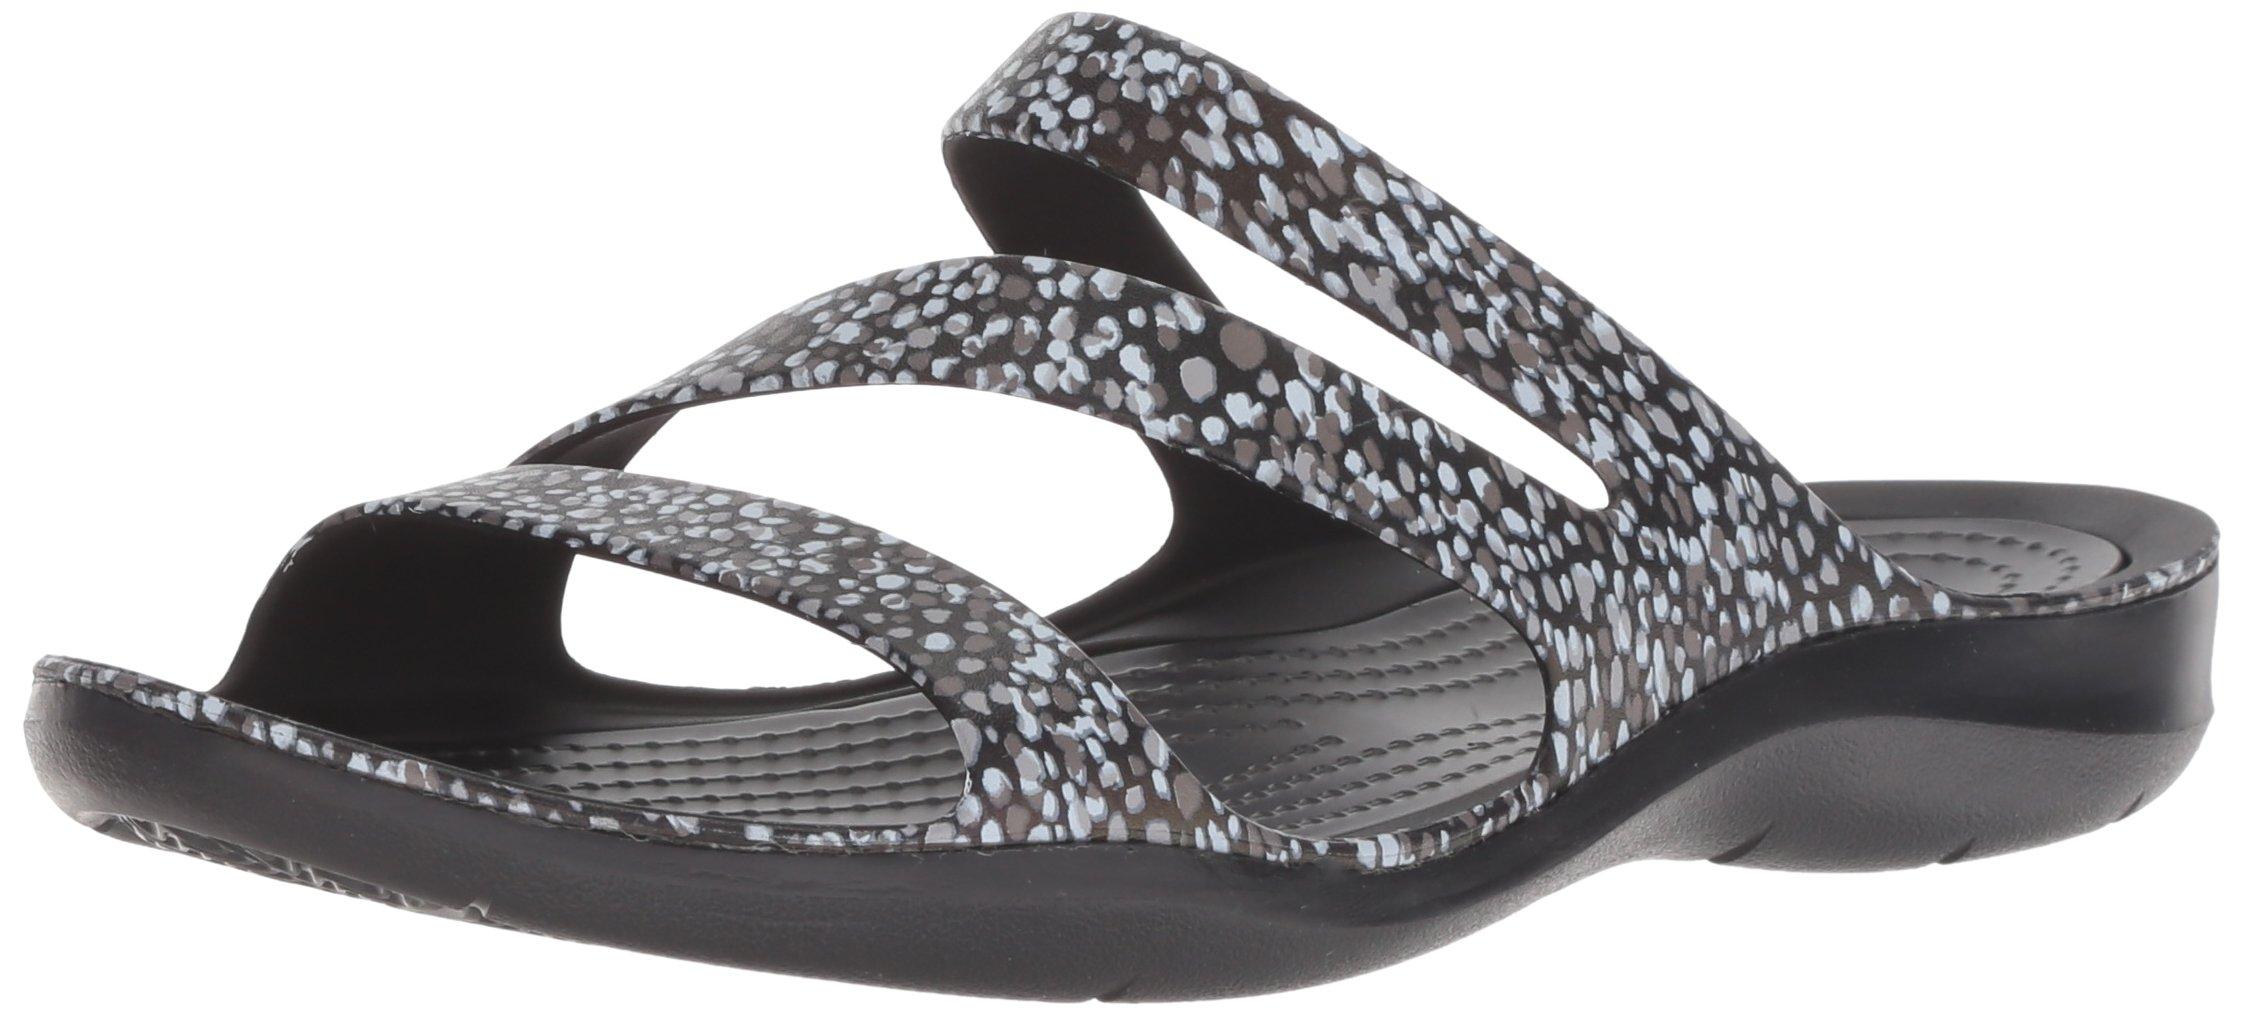 Crocs Women's Swiftwater Graphic W Sport Sandal, Dots, 11 M US